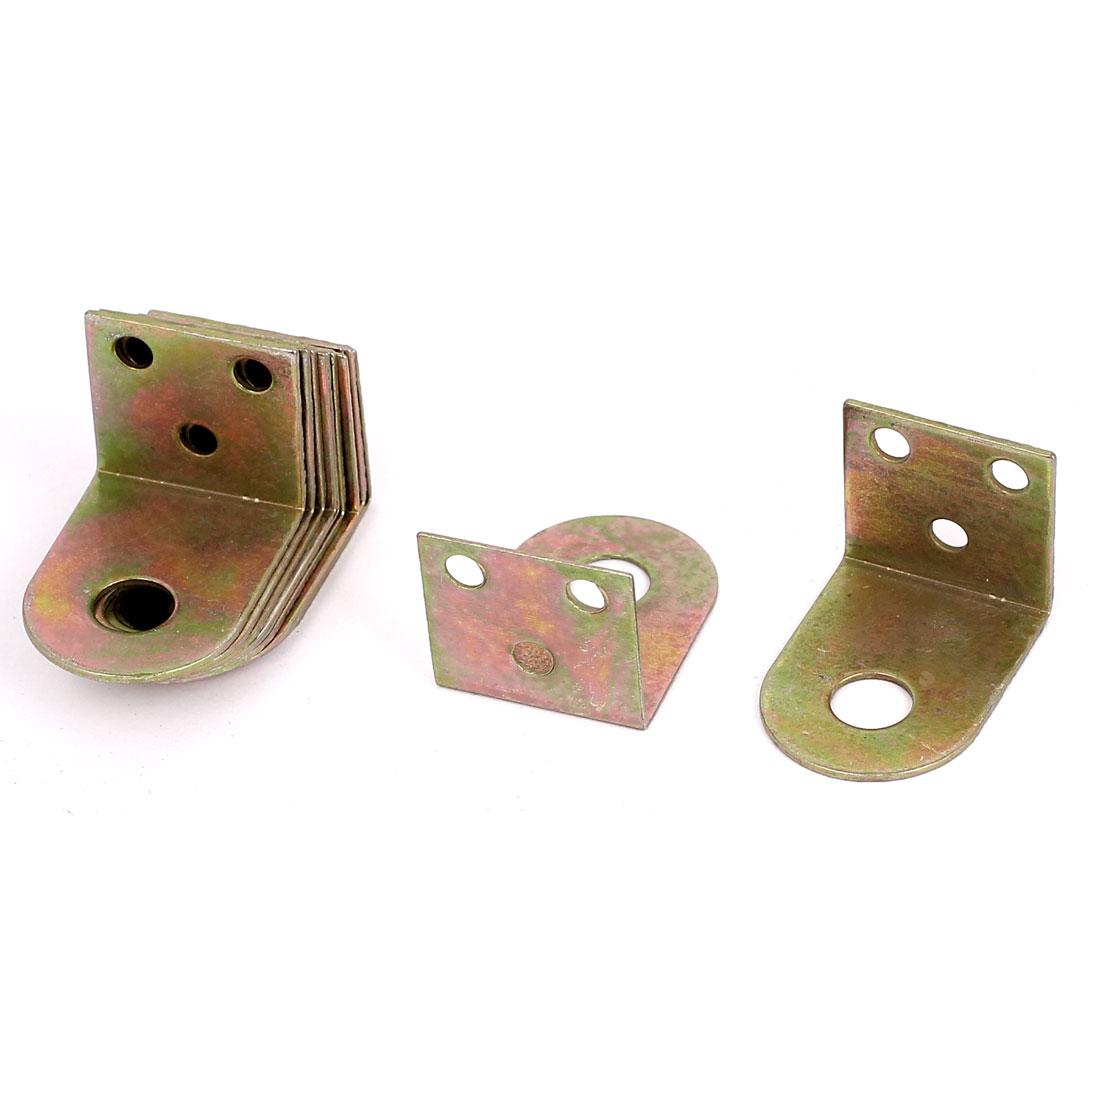 34mmx24mmx25mm L Shape Zinc Plated Shelf Corner Brace Right Angle Bracket 12pcs